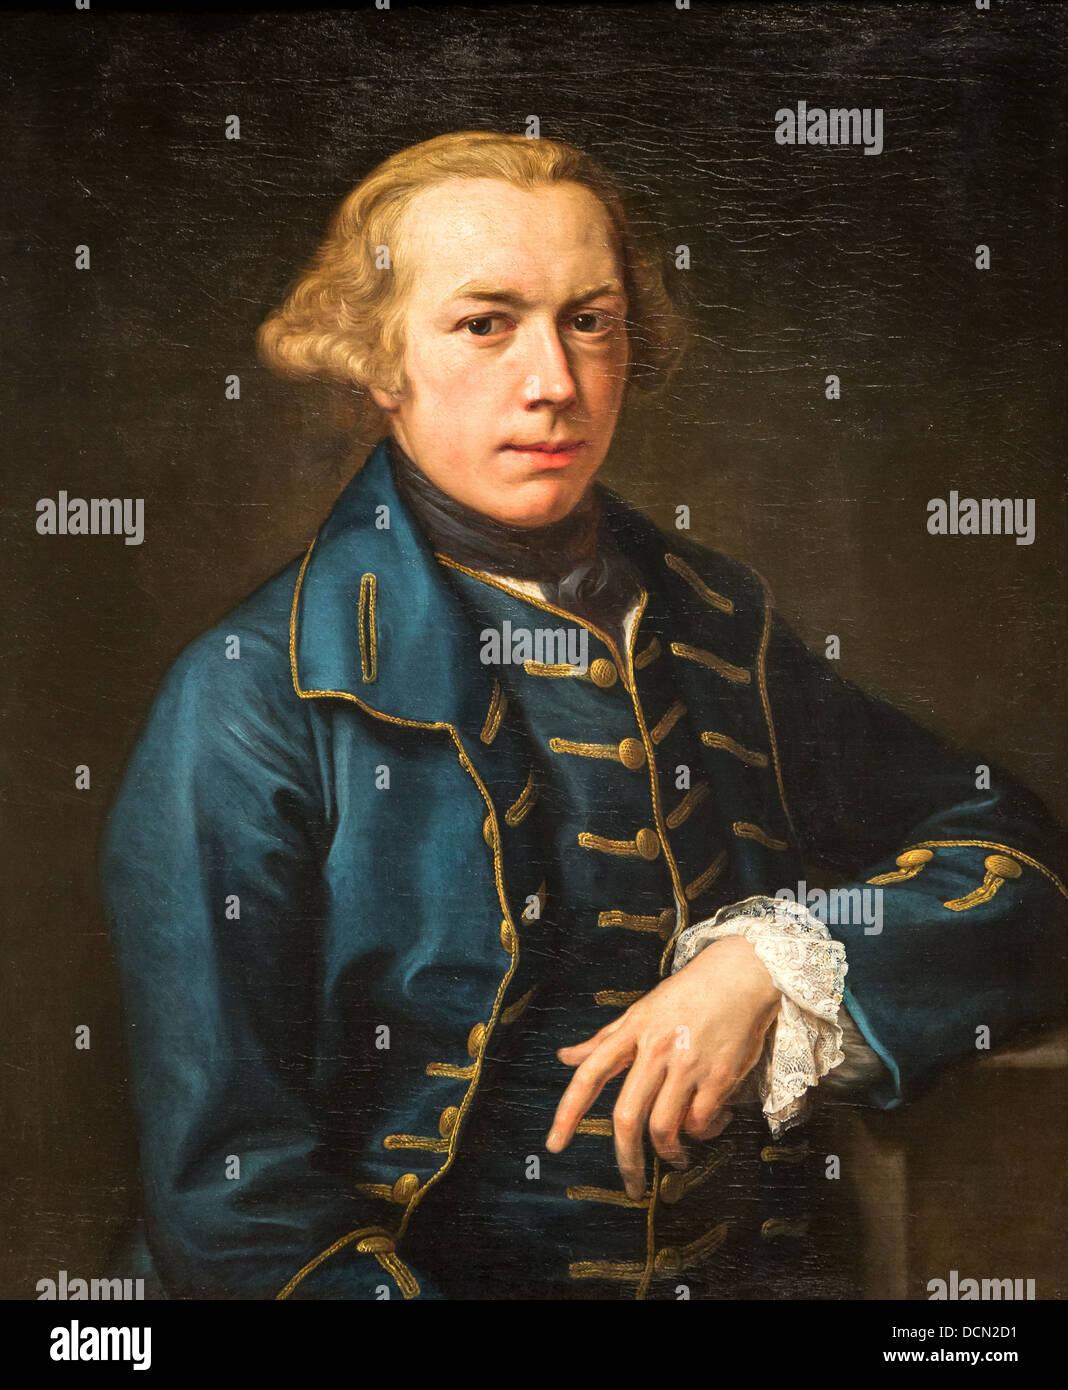 18th century  -  Portrait of a Gentleman, 1762 - Pompeo Batoni Philippe Sauvan-Magnet / Active Museum - Stock Image